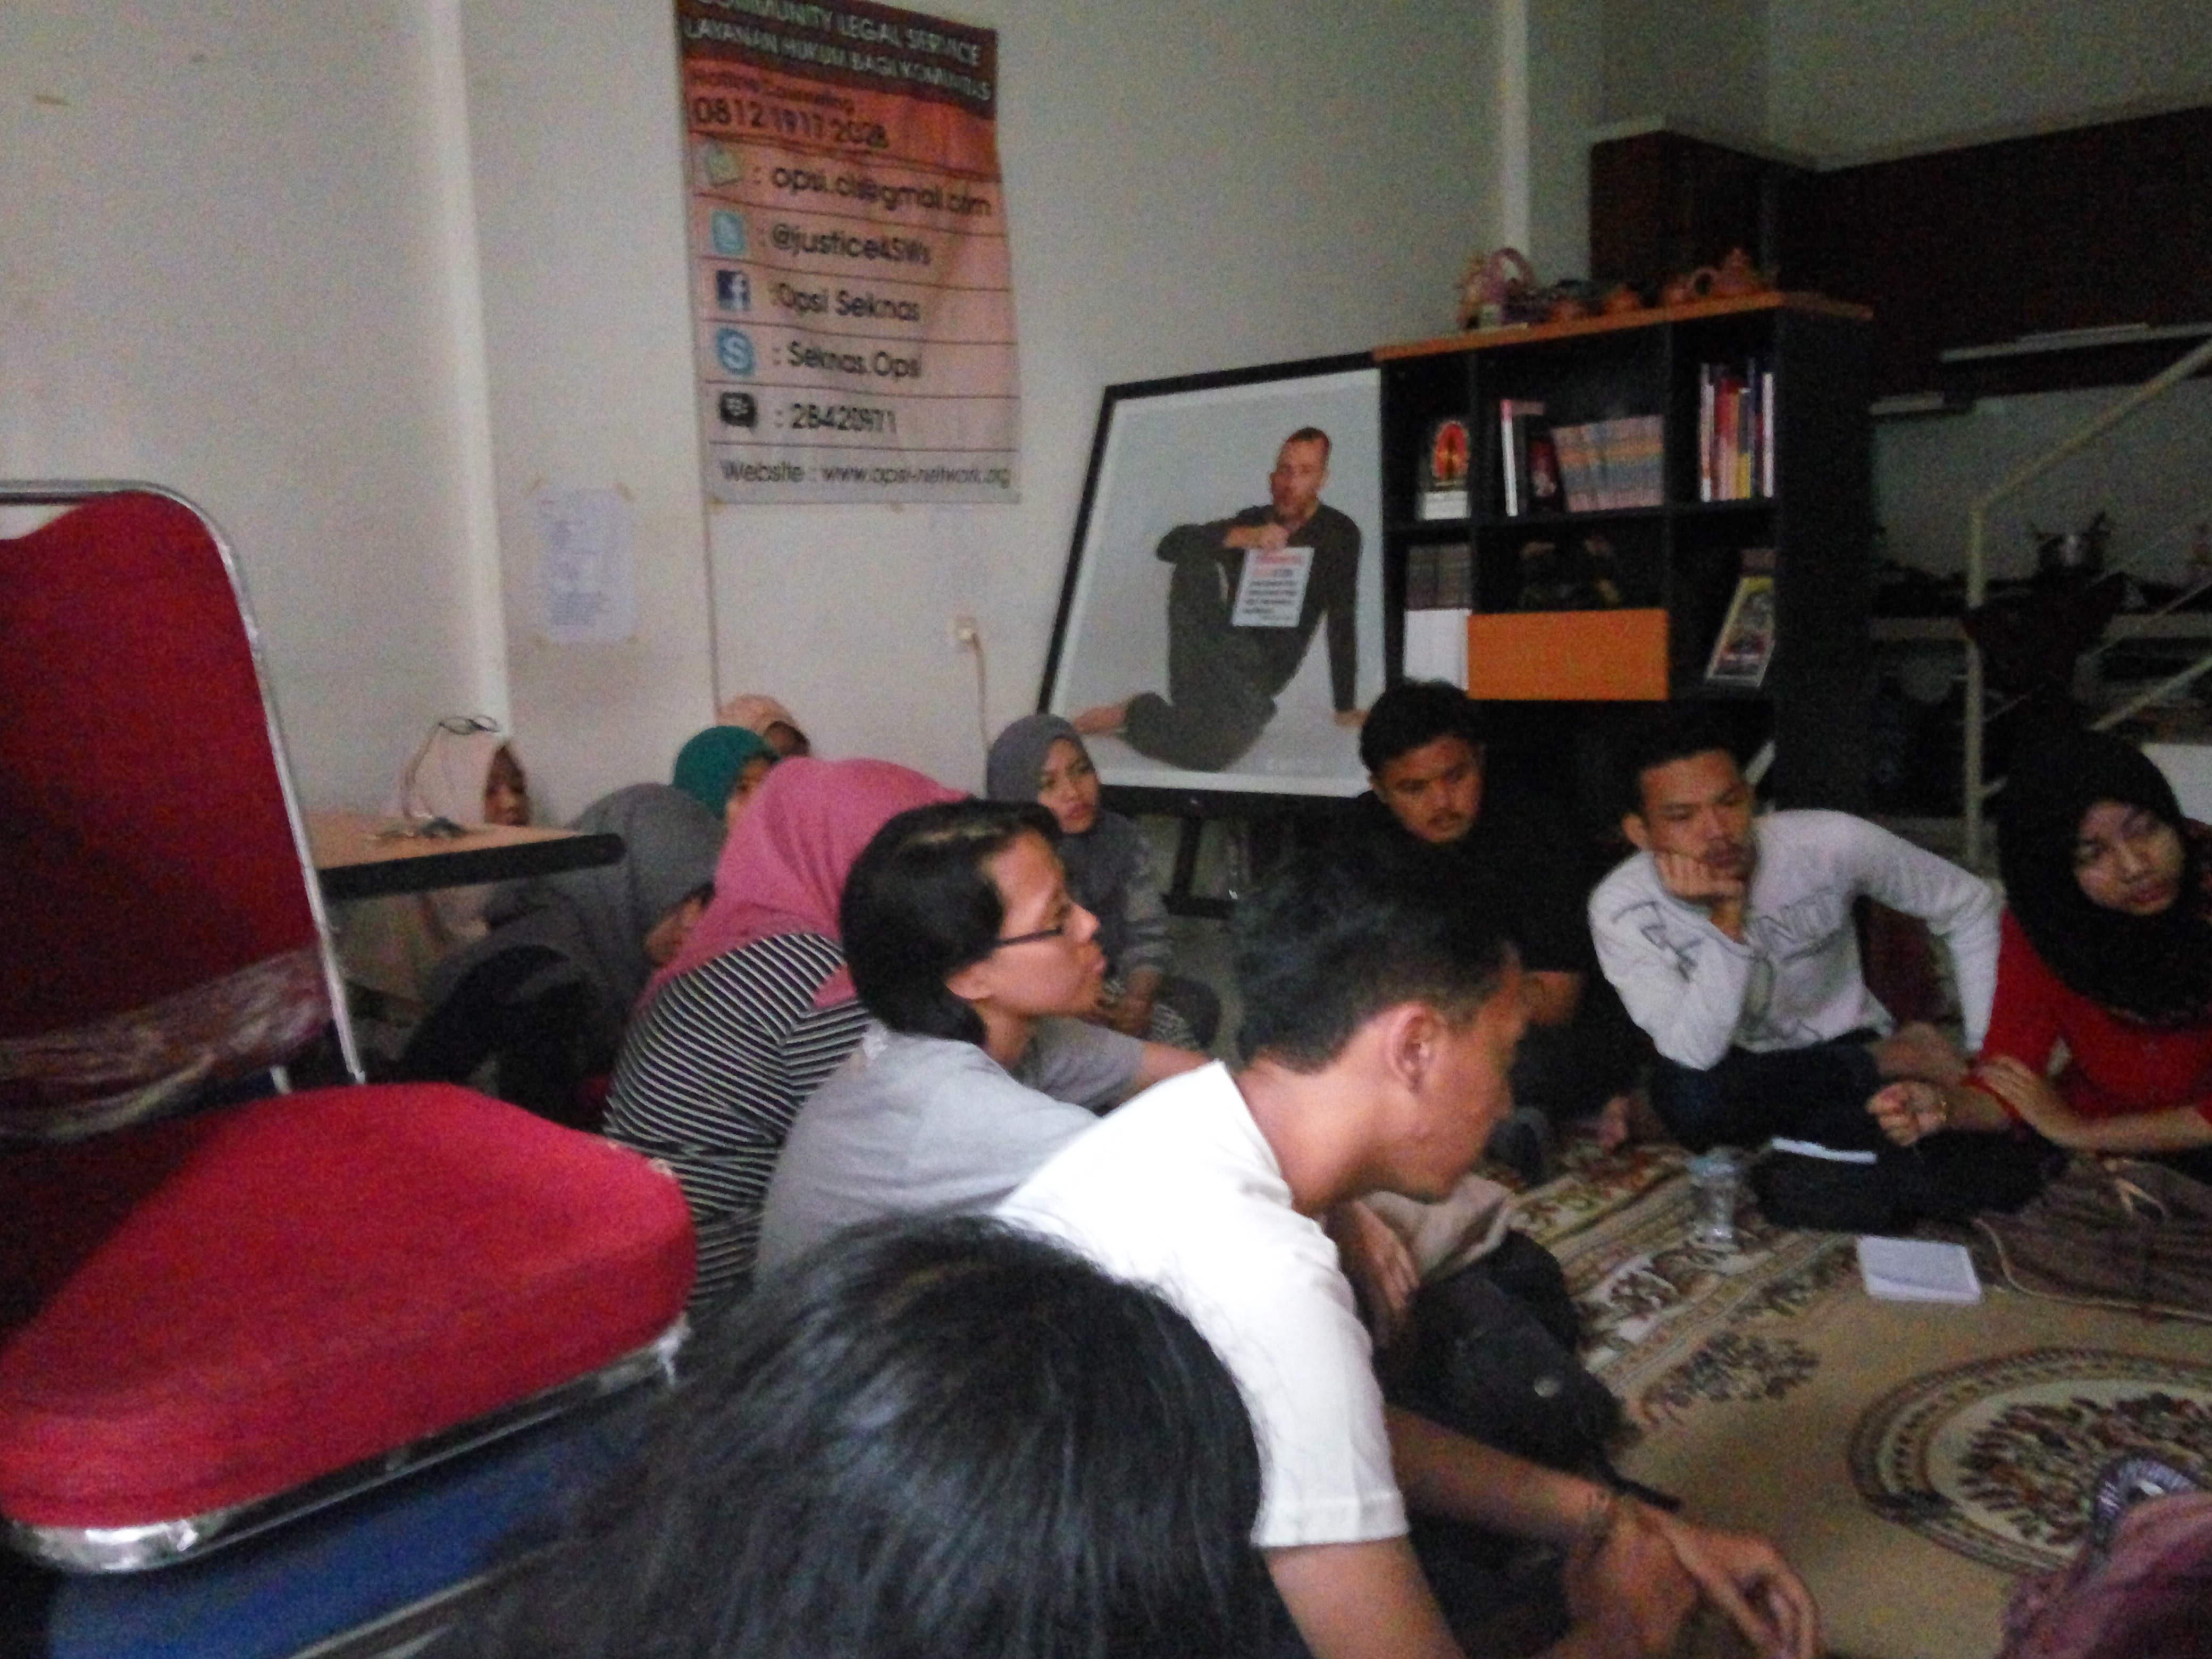 Peserta berkunjung ke OPSI. Mempelajari mengenai aspek-aspek hak asasi manusia dalam kehidupan pekerja seks.